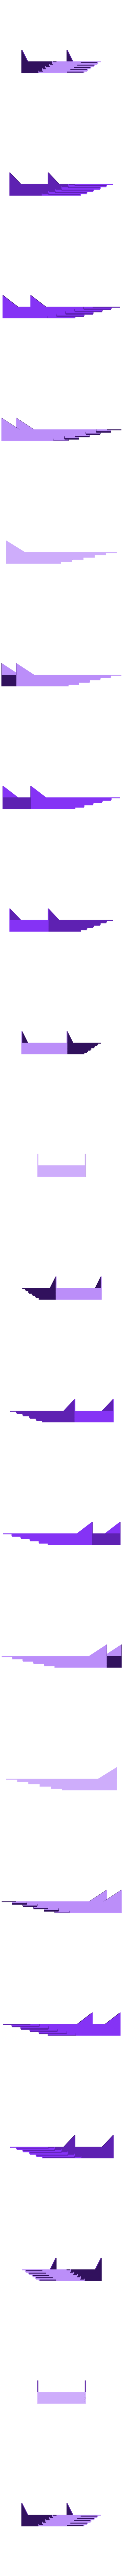 Soul_WoundSleeve.stl Télécharger fichier STL gratuit Boss Monster Dungeon Board & Card Holders • Plan pour impression 3D, jbrum360